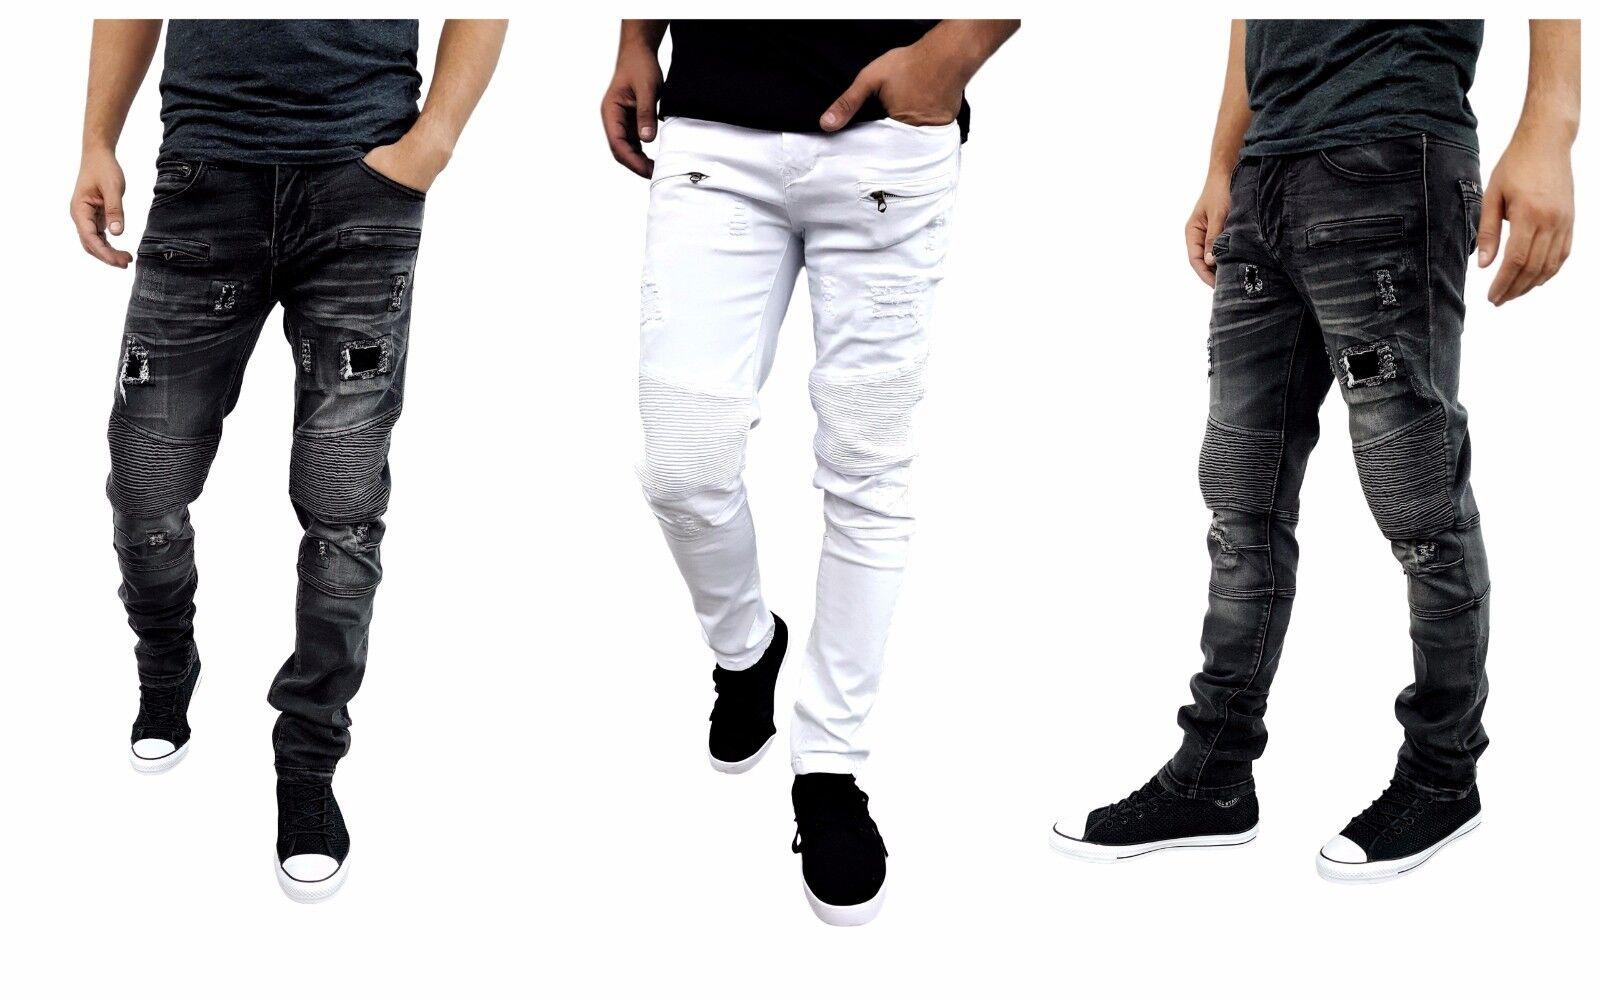 Etzo Mens biker jeans, Skinny fit premium Ripped Distressed